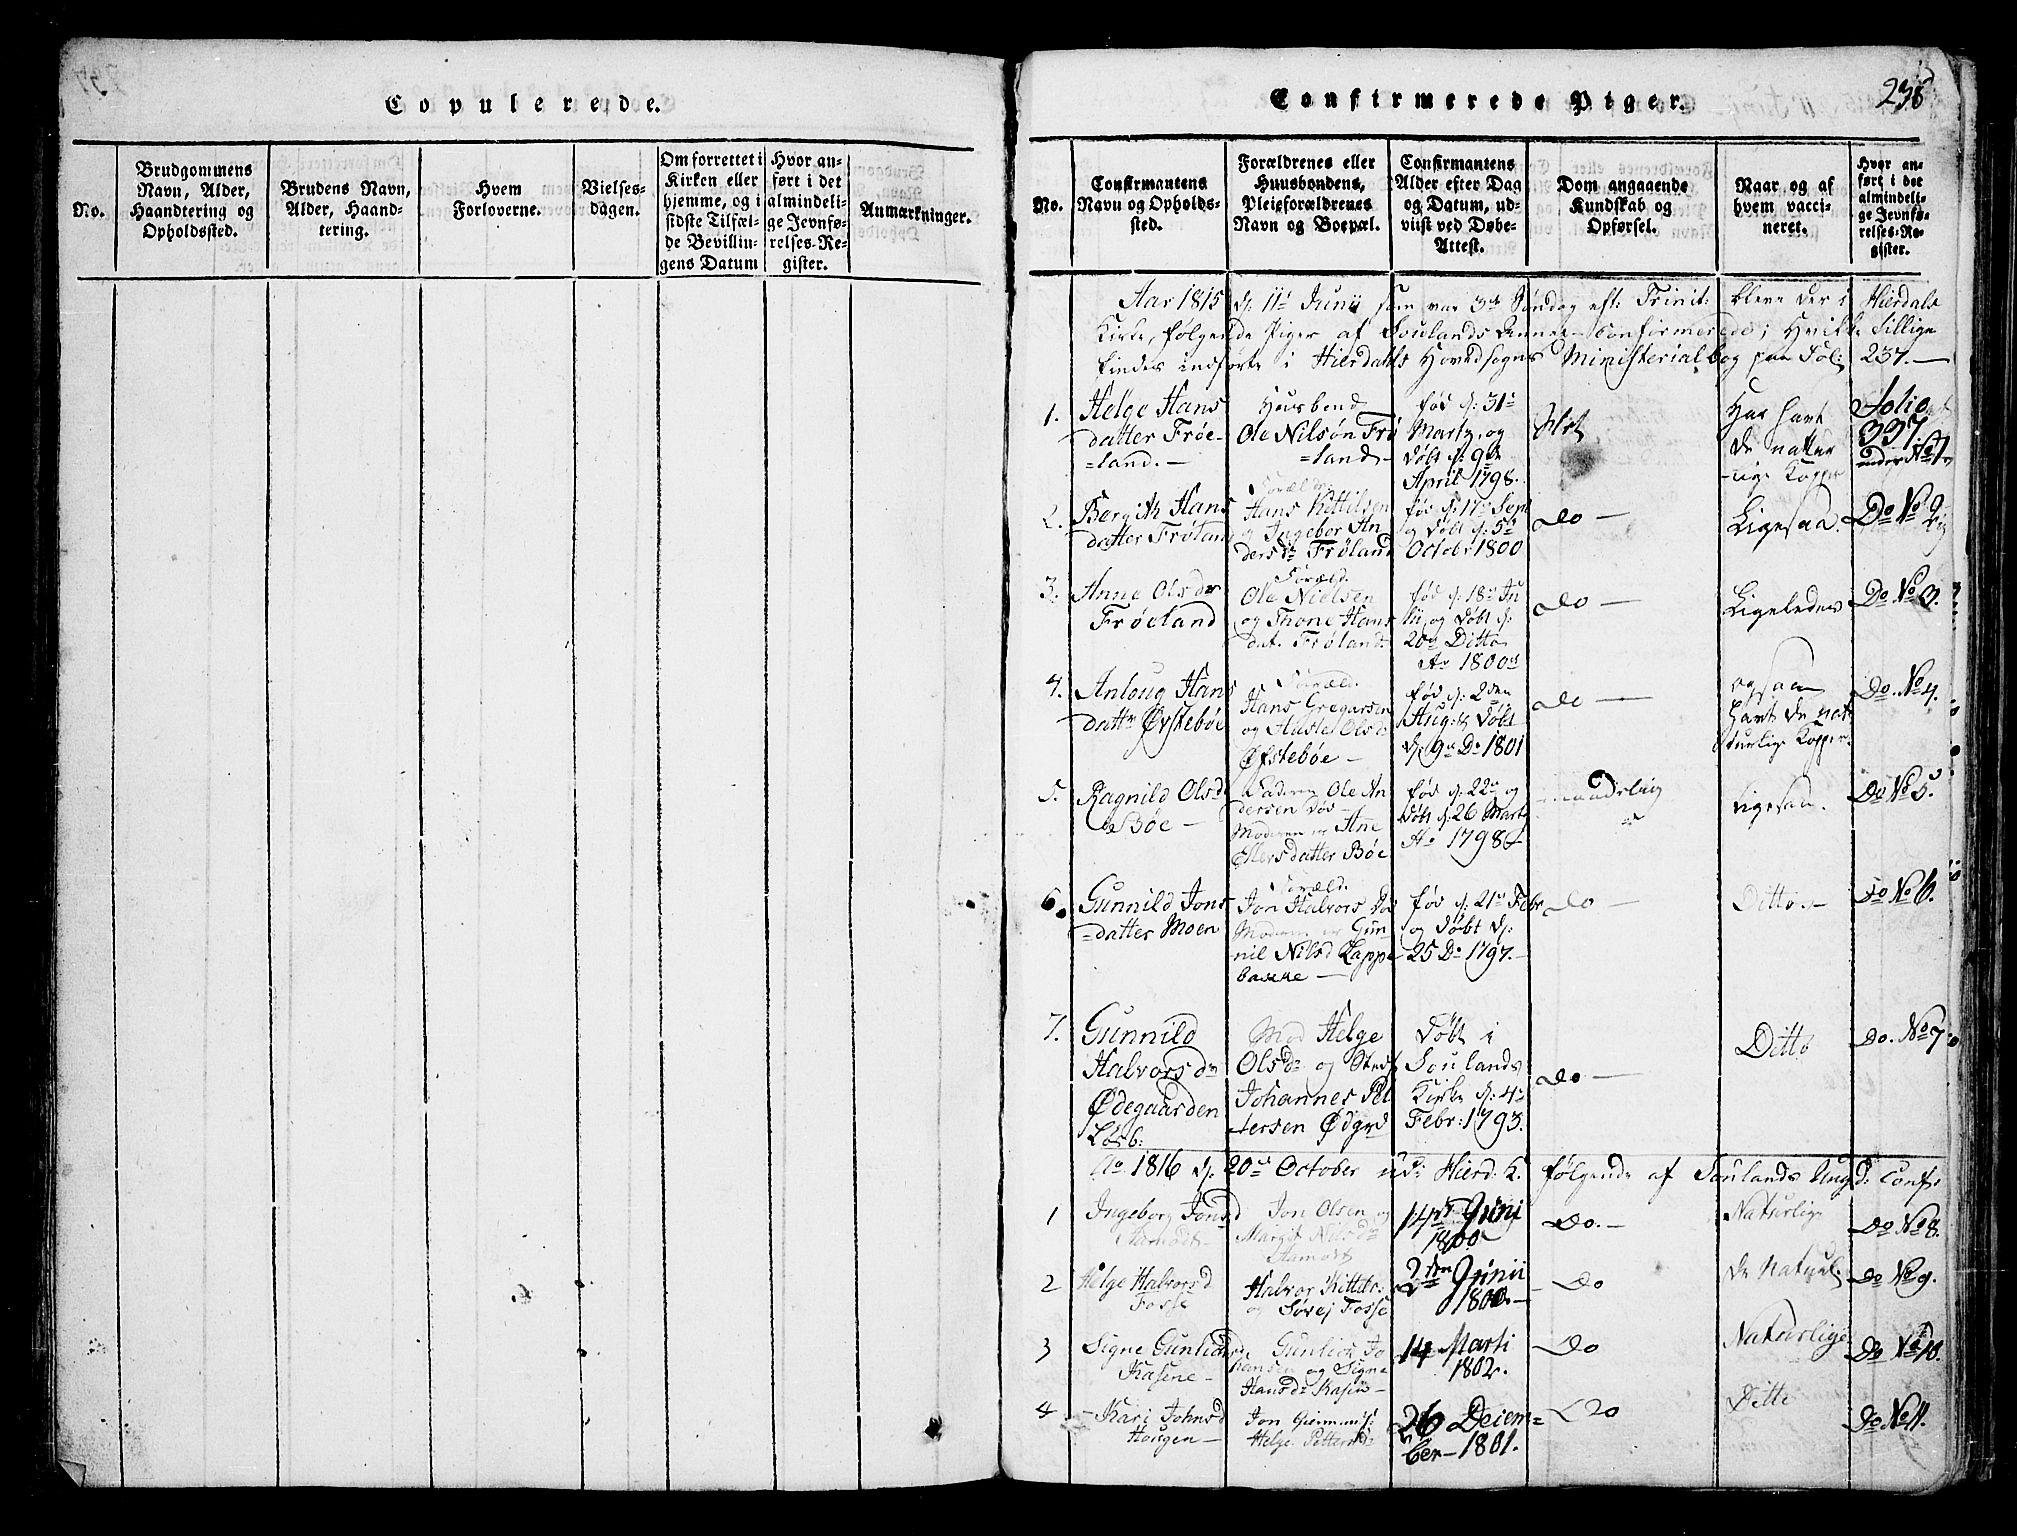 SAKO, Hjartdal kirkebøker, F/Fb/L0001: Ministerialbok nr. II 1, 1815-1843, s. 238